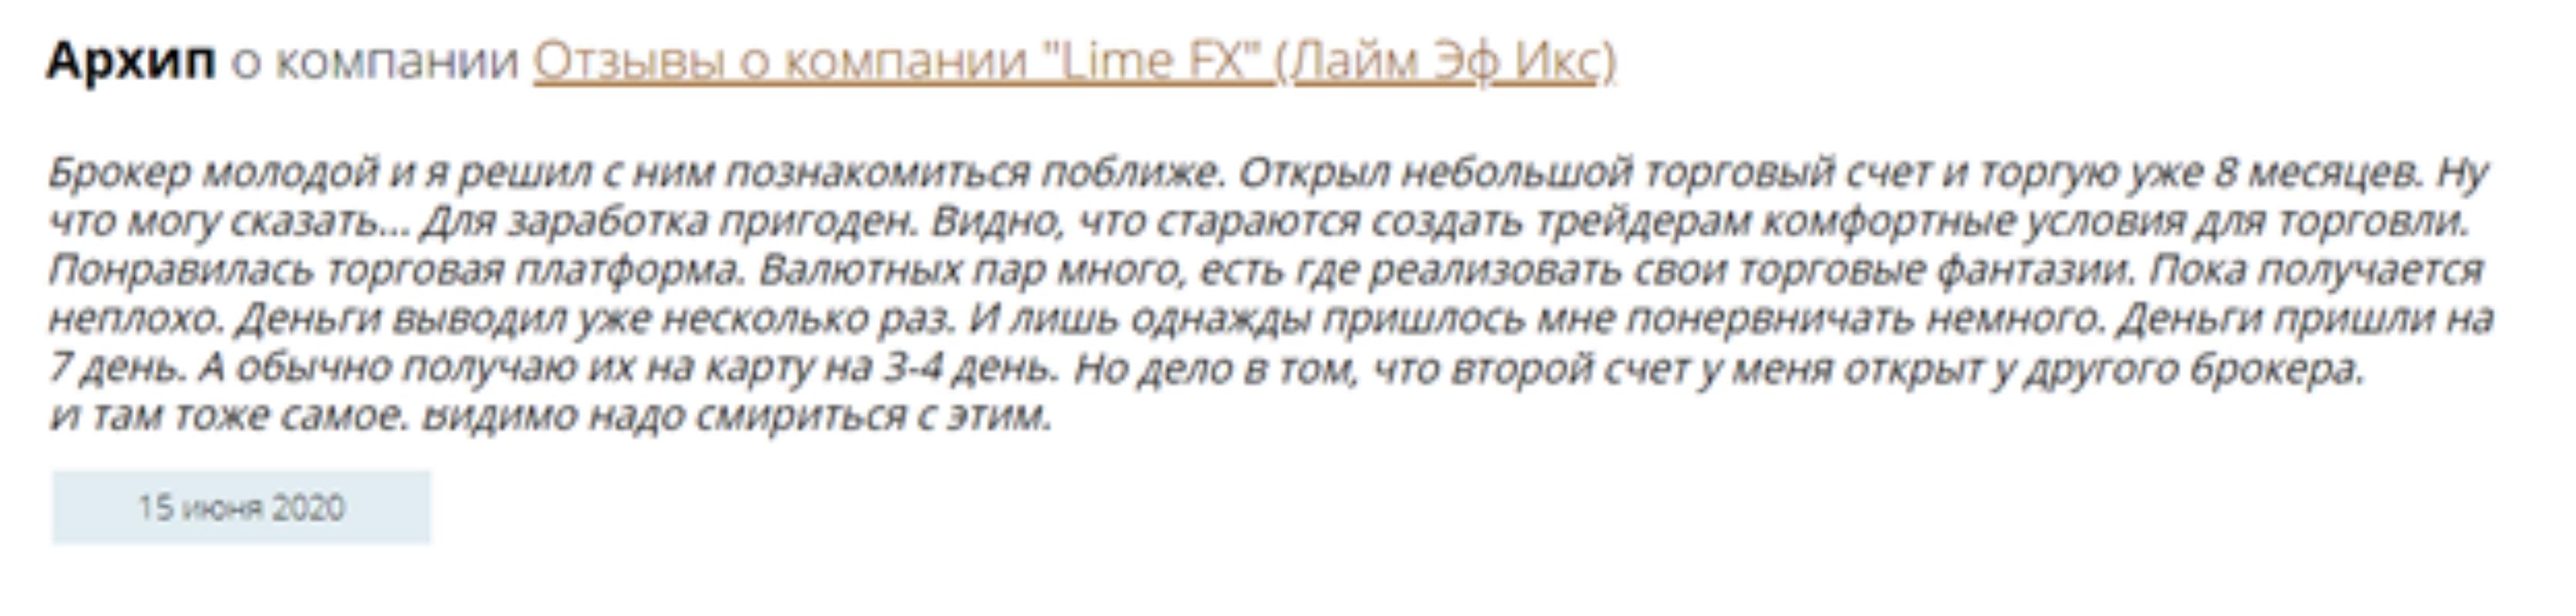 Форекс брокер LimeXF: отзывы и обзор